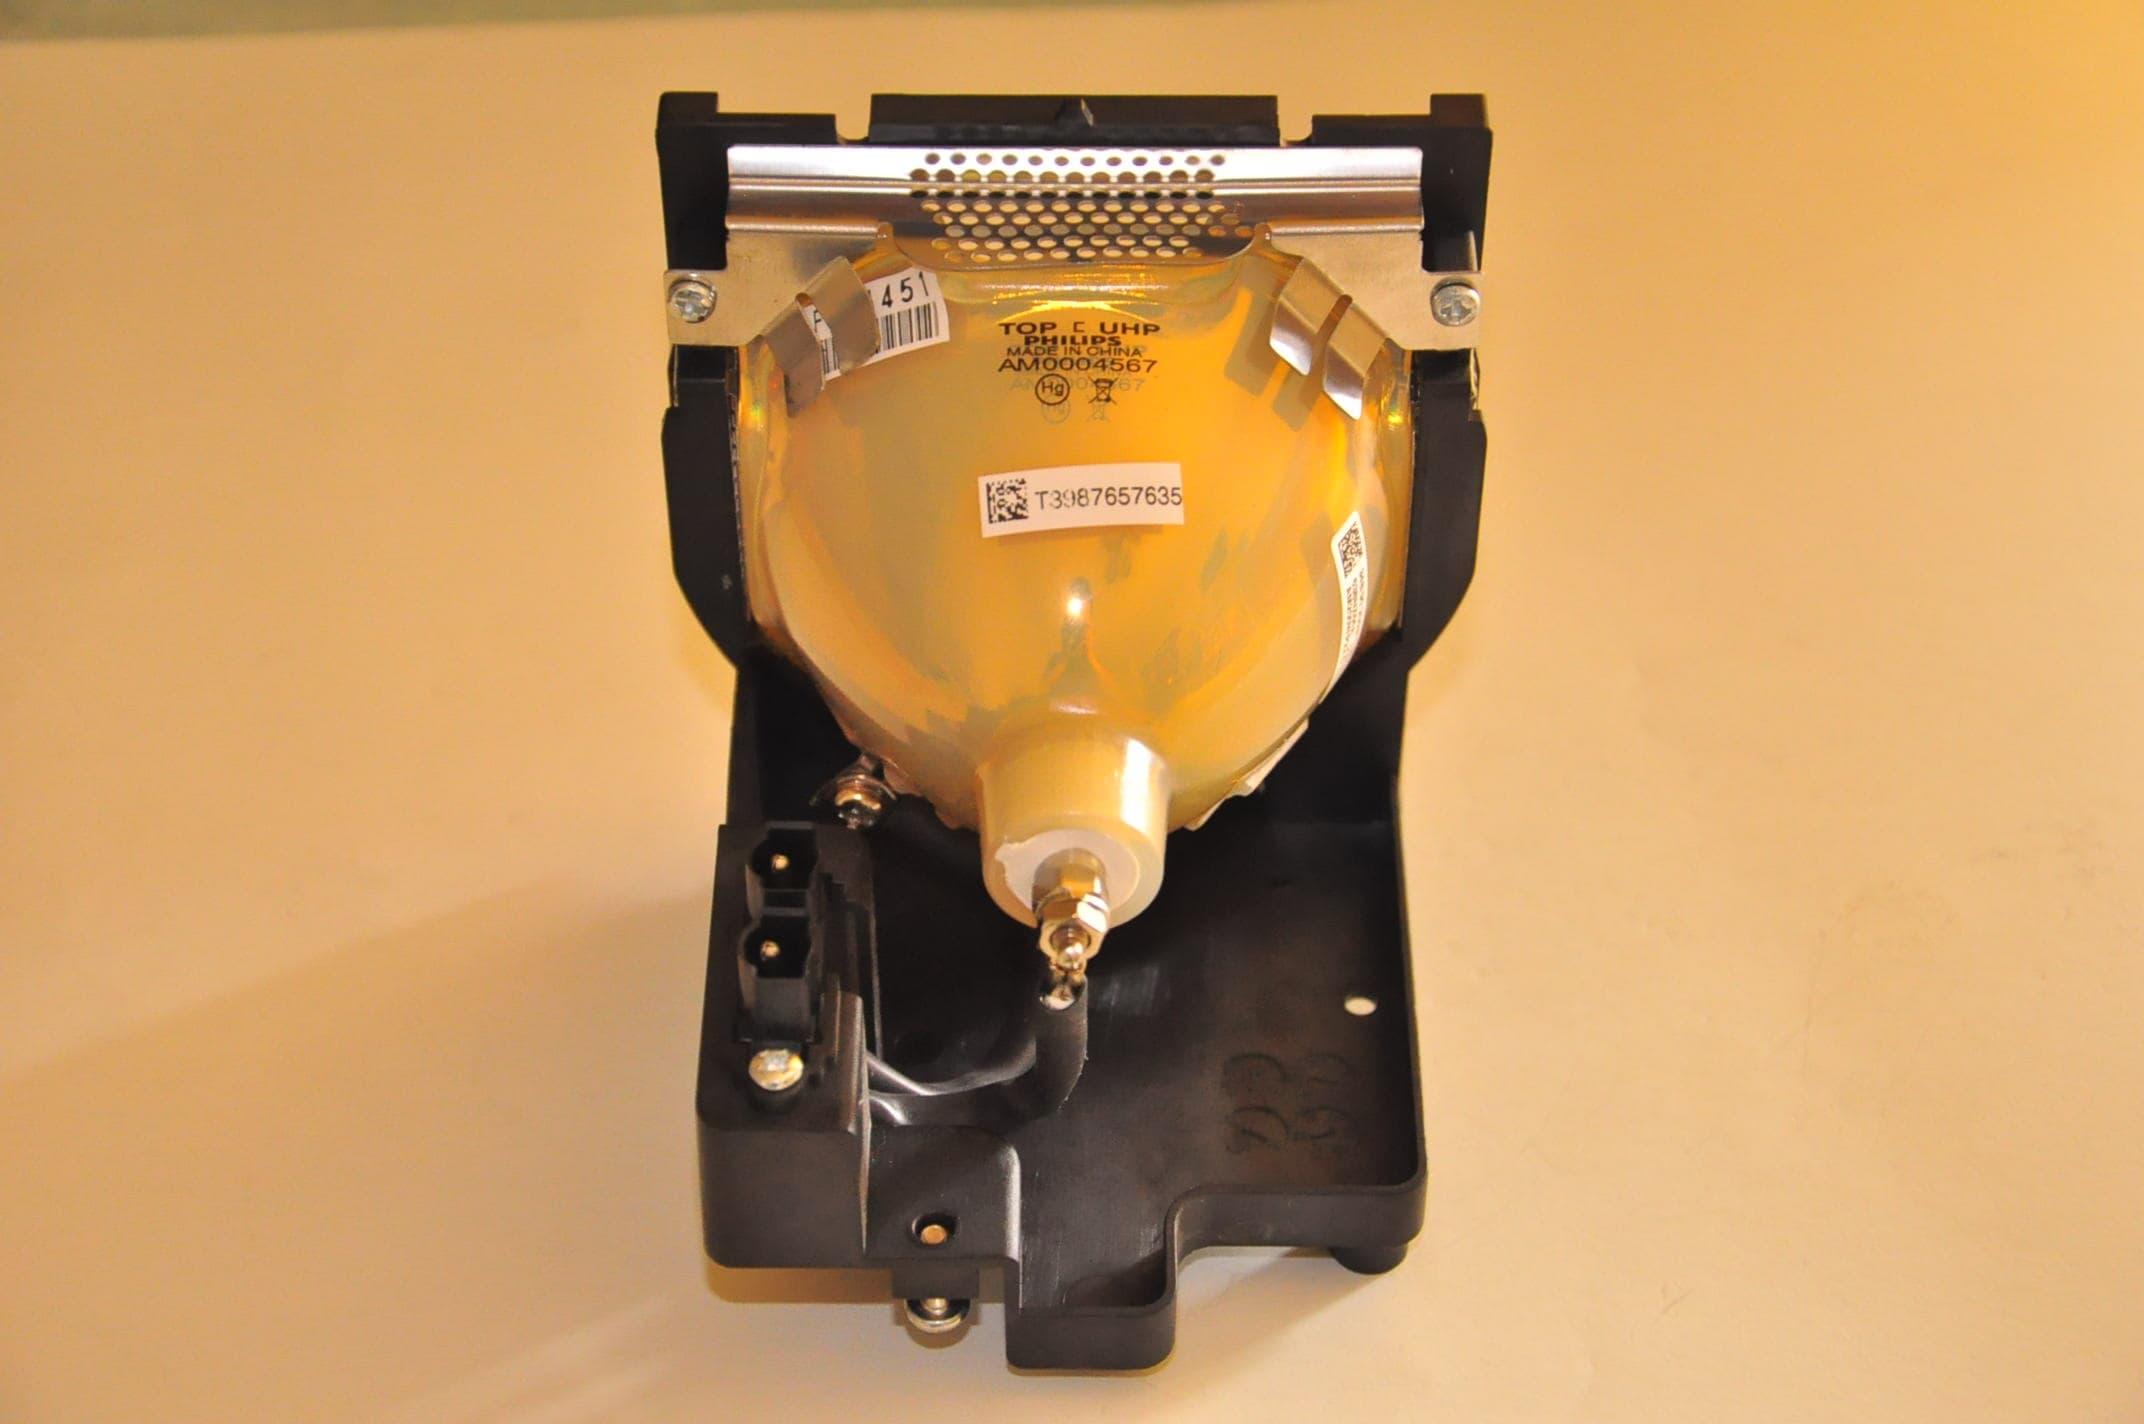 LMP42 UHP200W 1.3 P22.5 (3).jpg